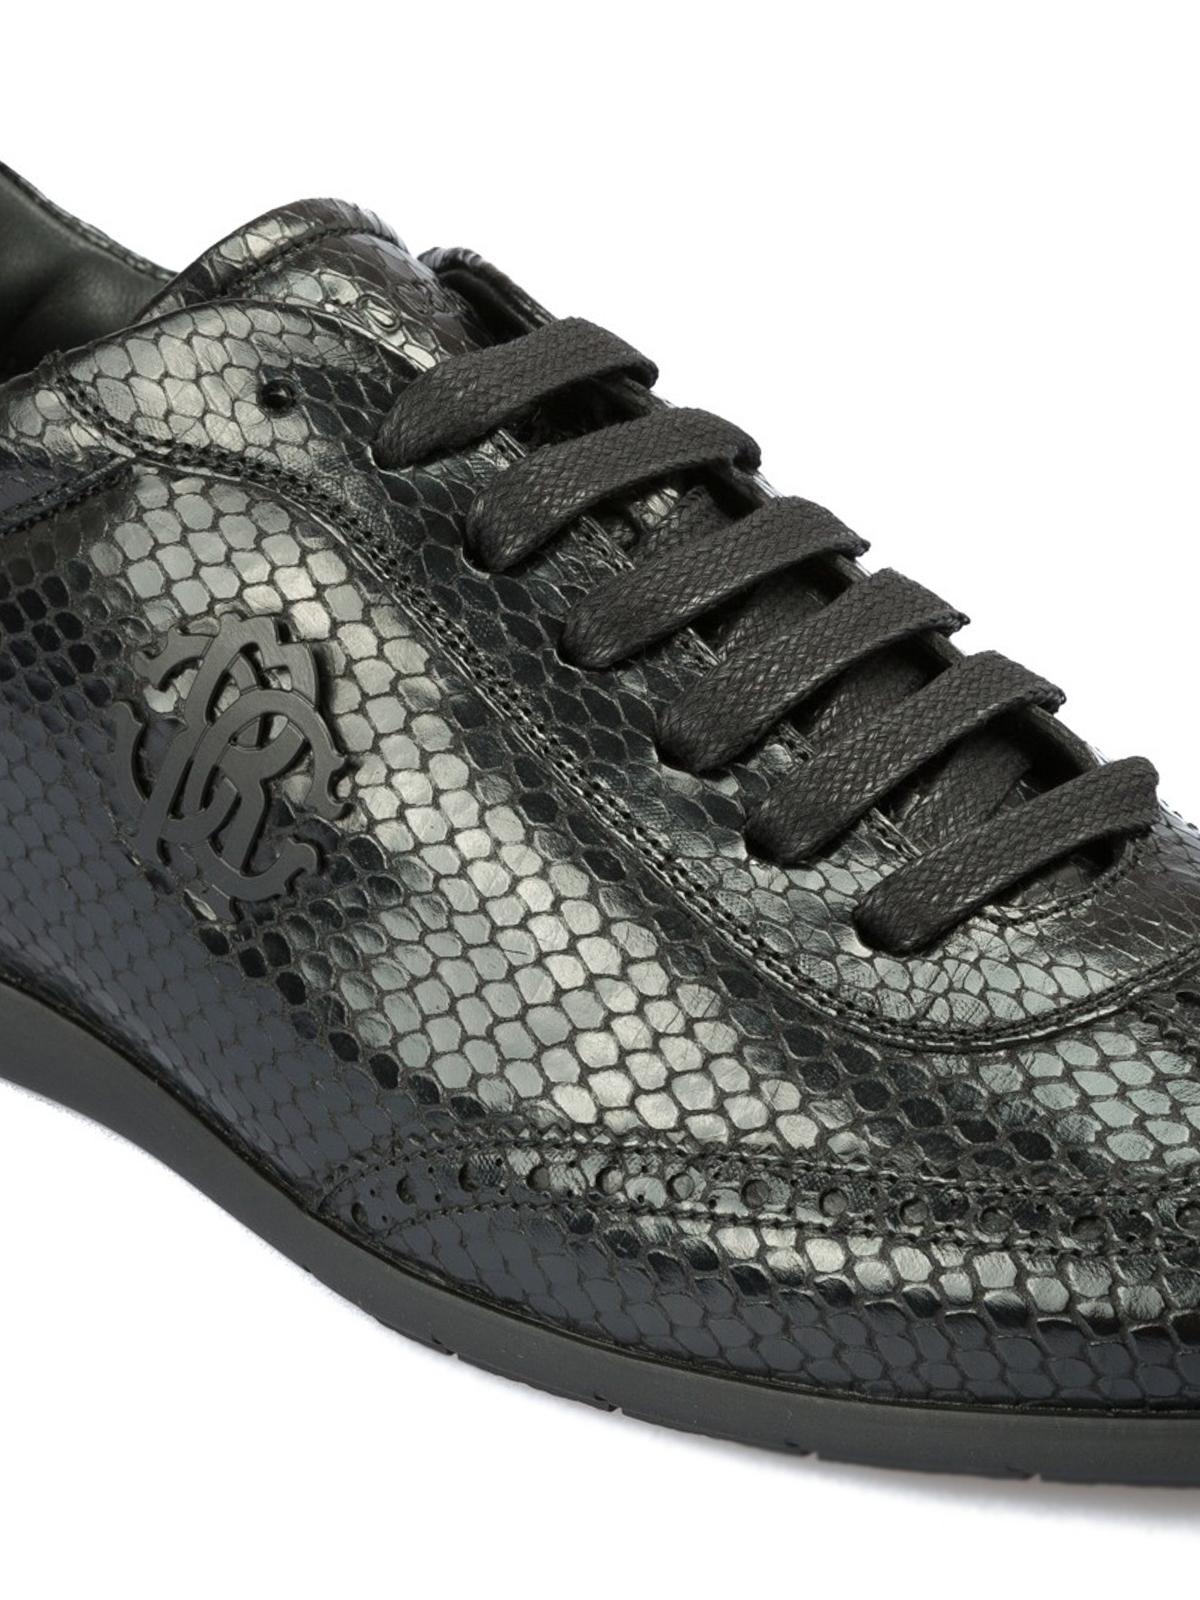 Roberto Cavalli - Python print leather